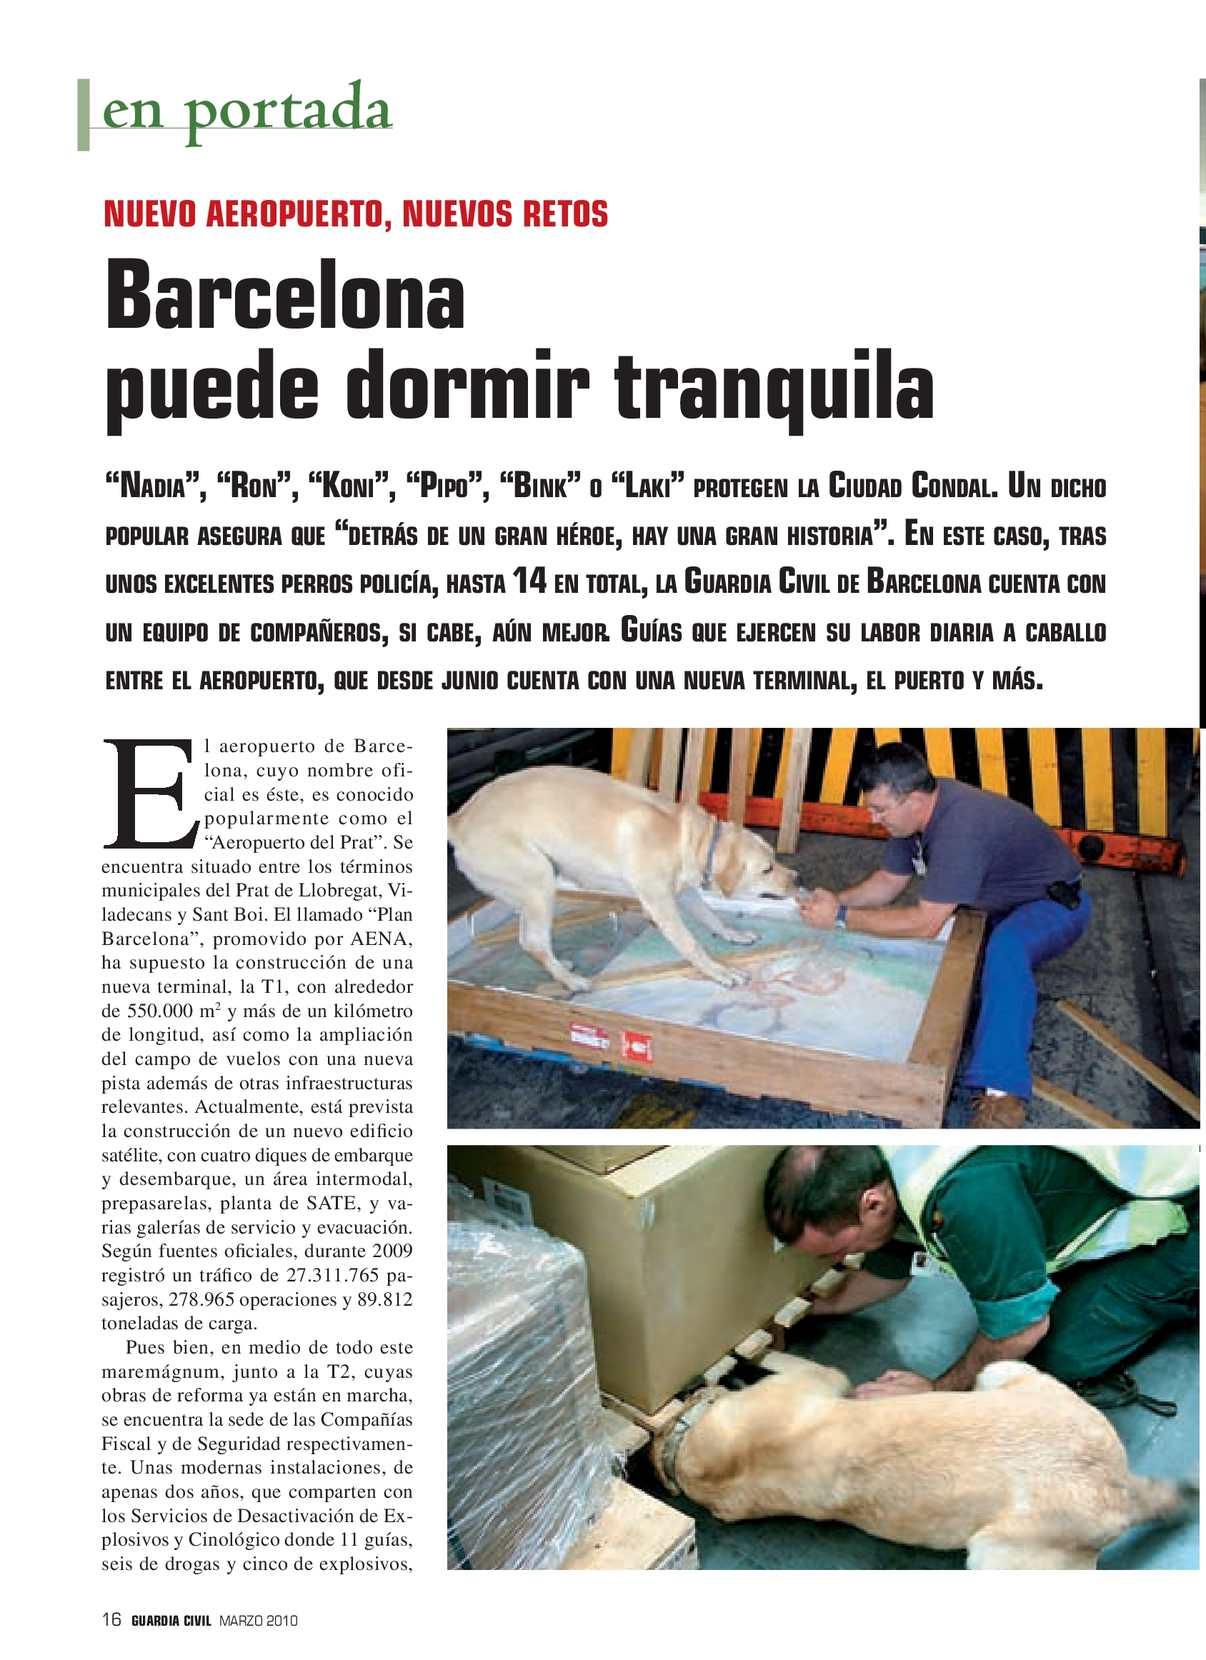 DRO - Drogas Reportaje Perros Antidroga